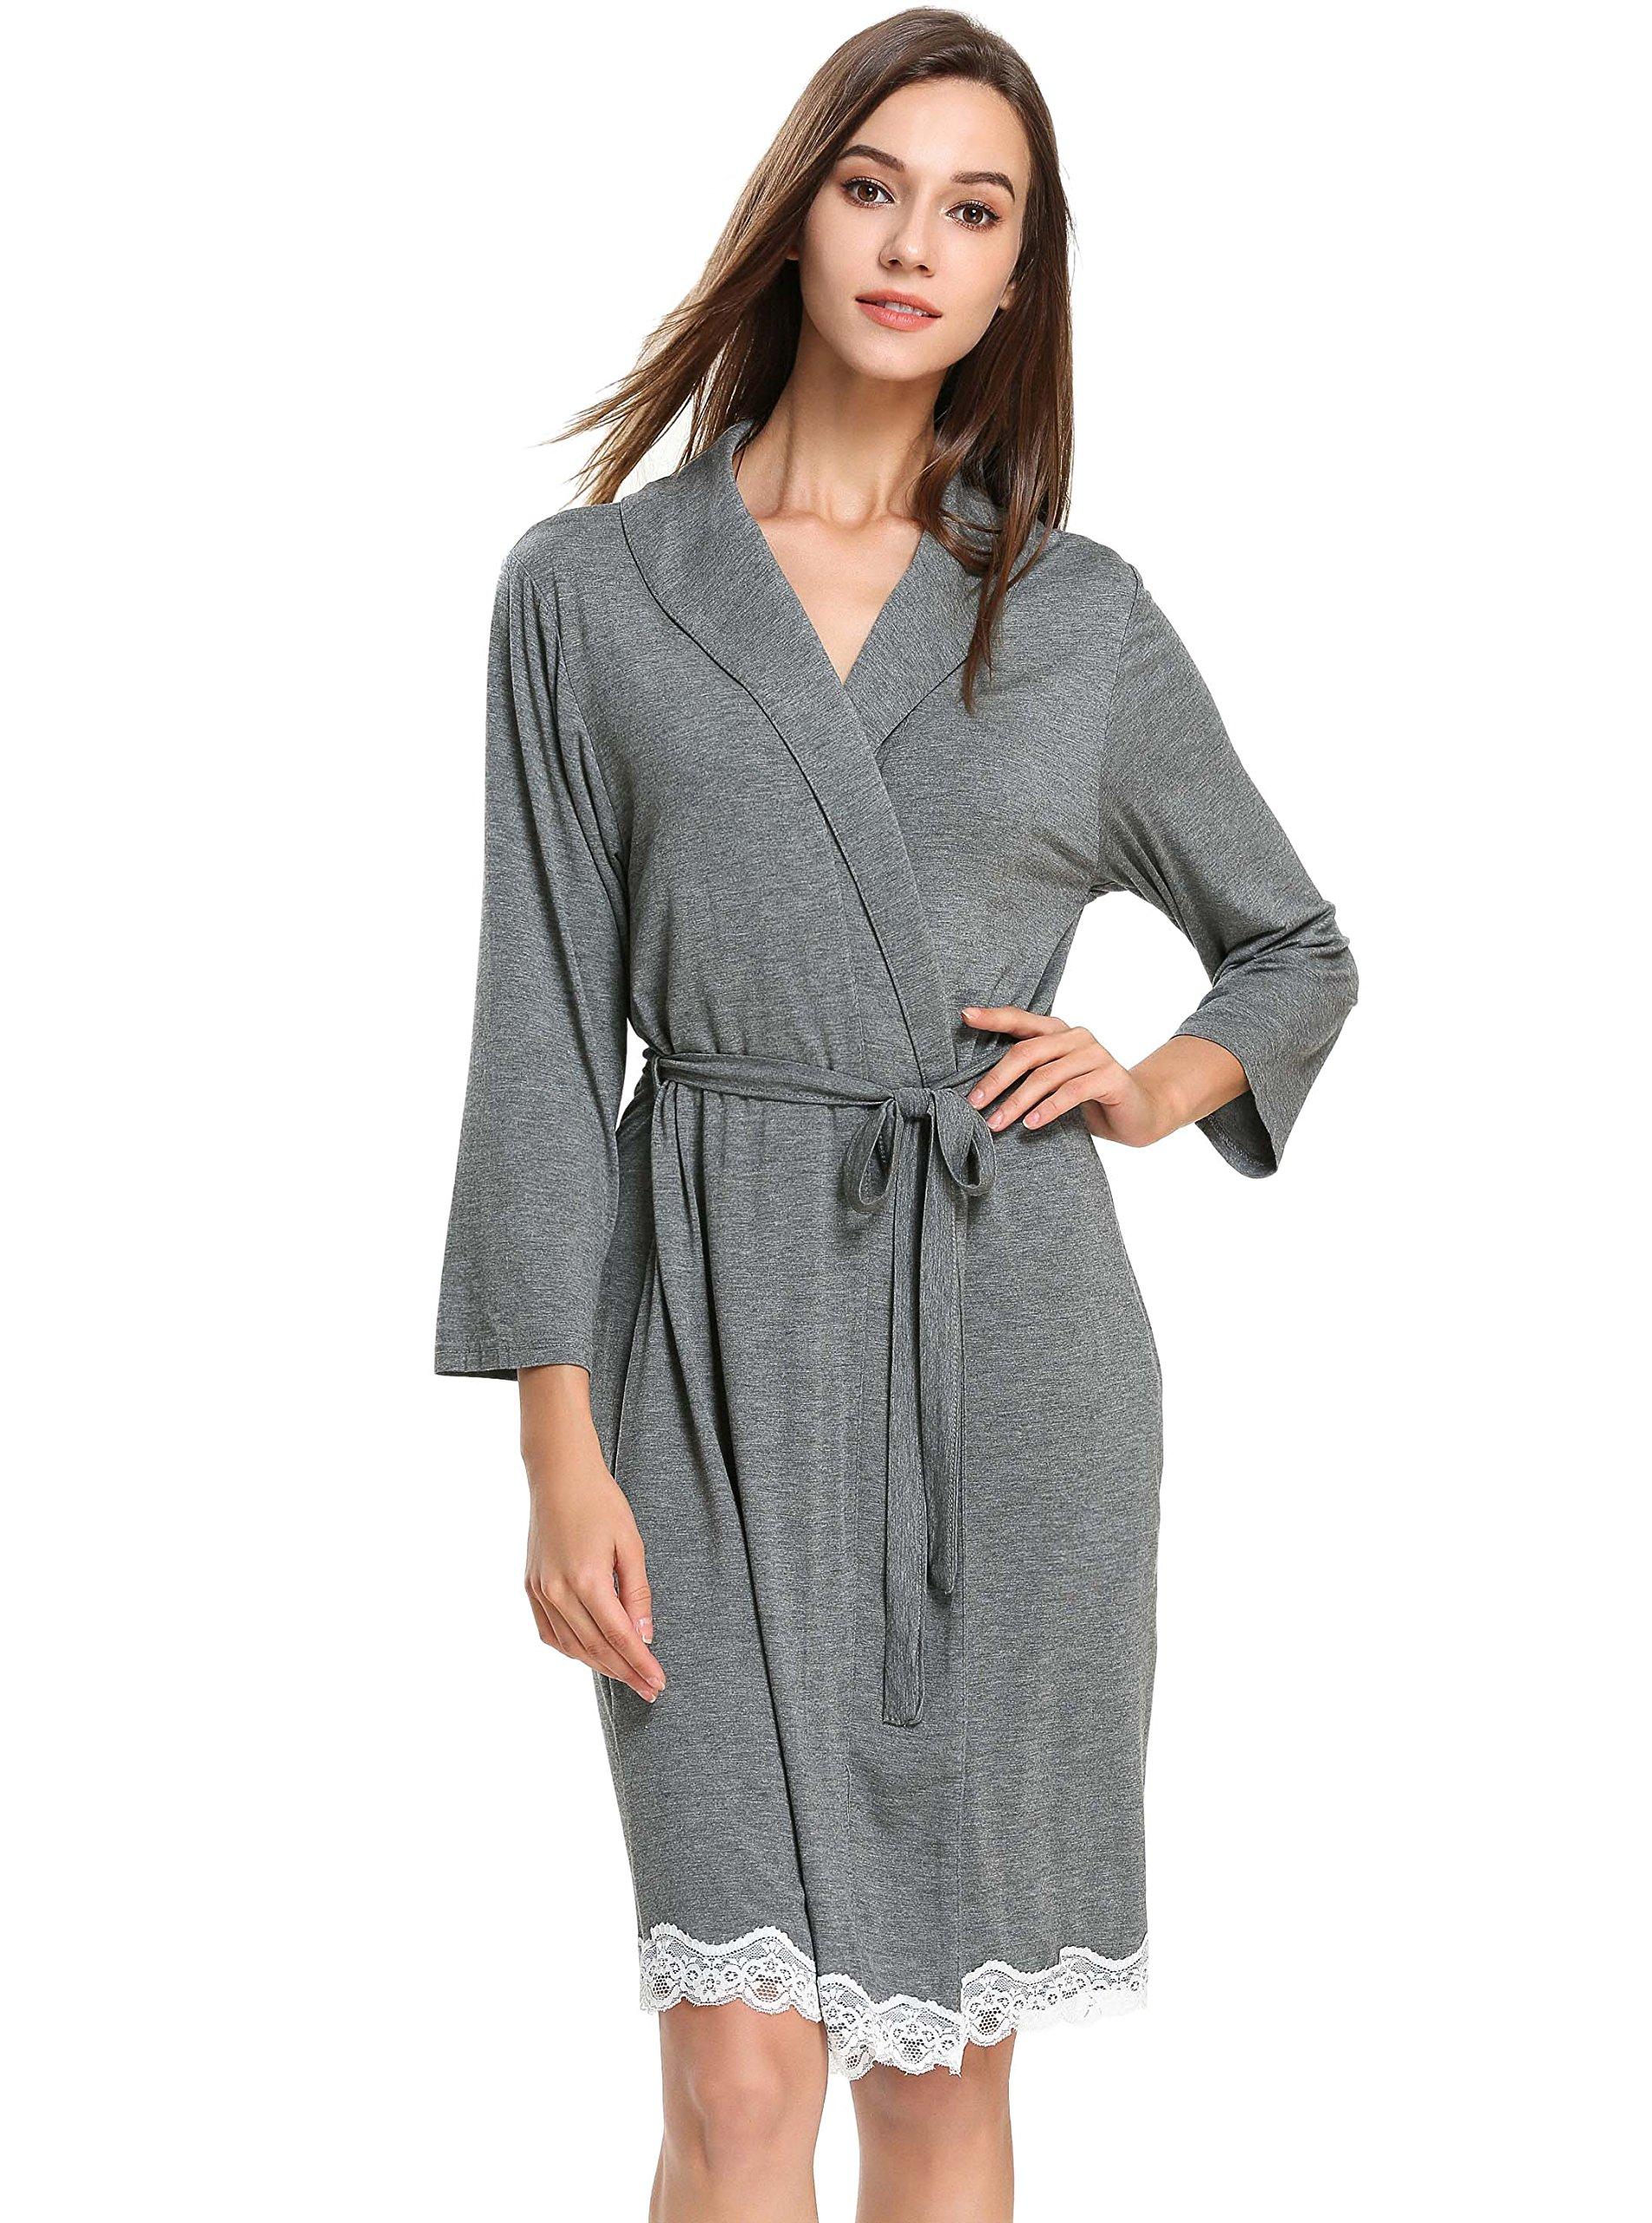 GUANYY Womens Robe Kimono Cotton Lightweight Lace Decor Bathrobe Sleepwear with Belt (Dark Gray,X-Large)